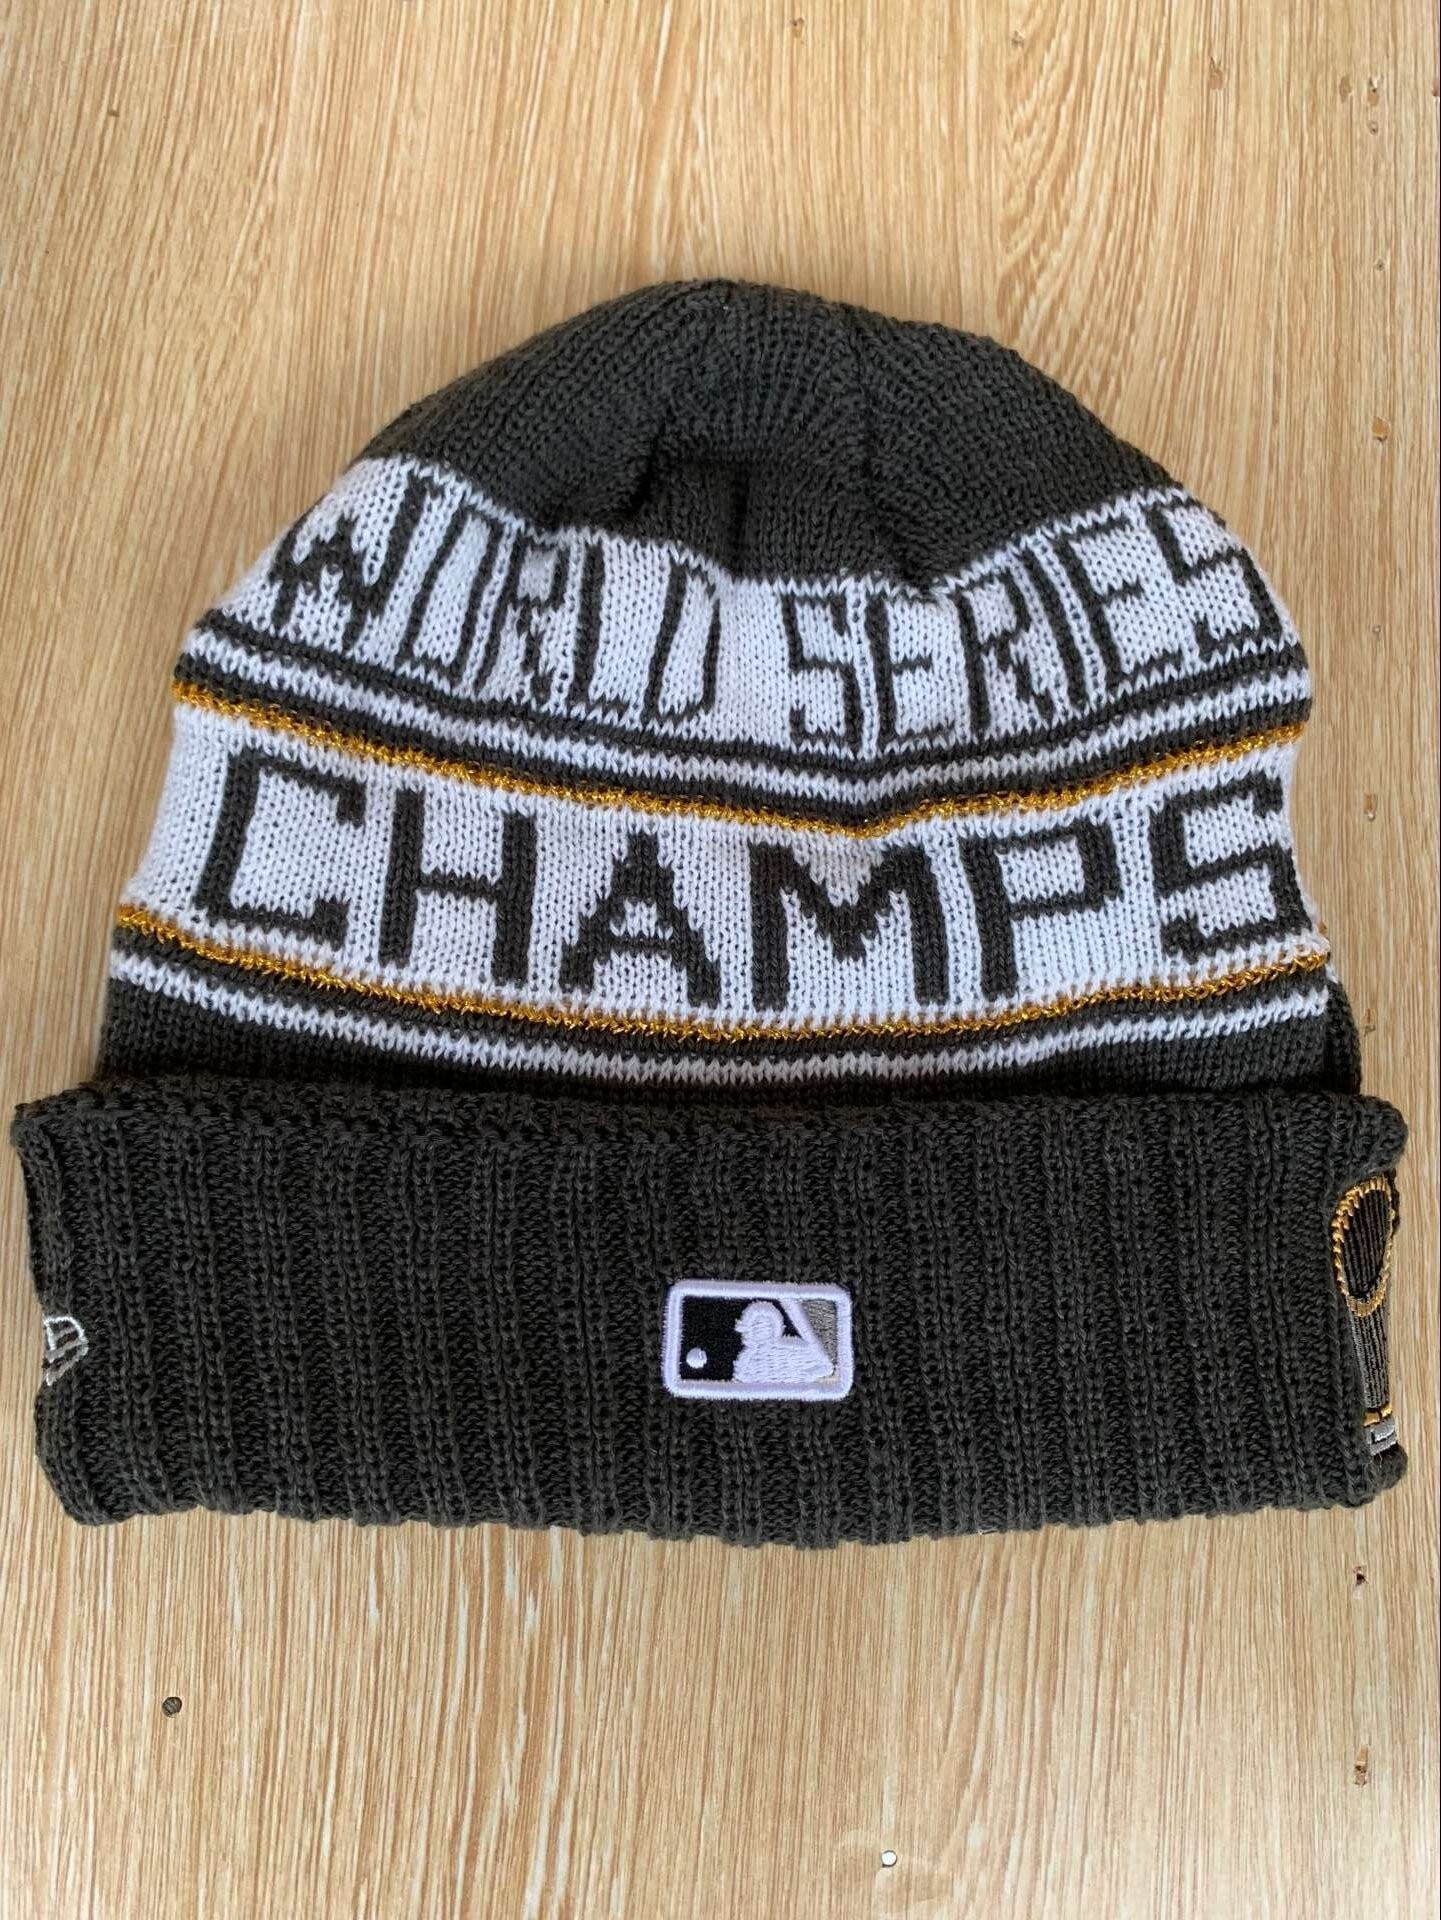 MLB Red Sox 2018 World Series Champions Knit Hat YD - MLB Hats - Hat ... bf432bf1e88